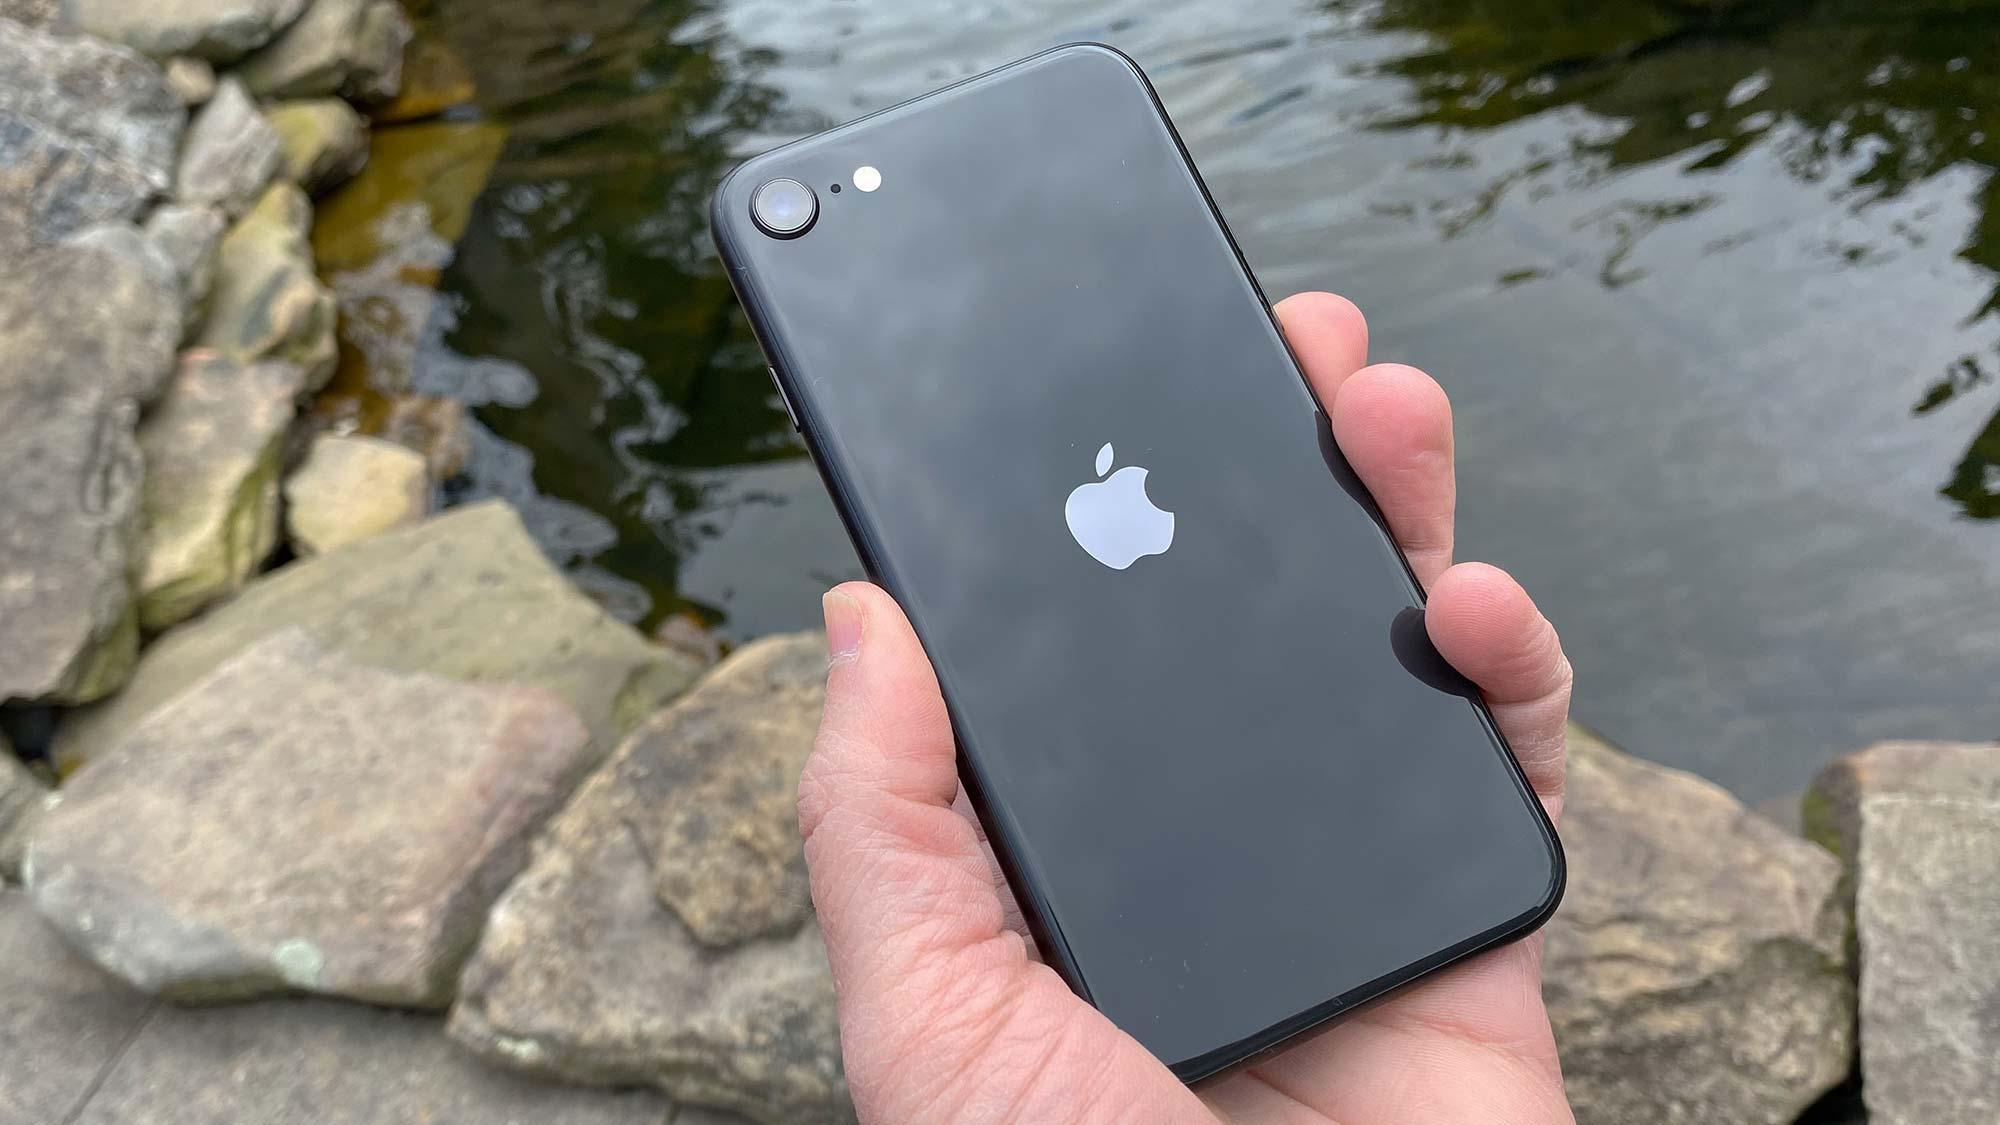 Best unlocked iphones: iPhone SE 2020